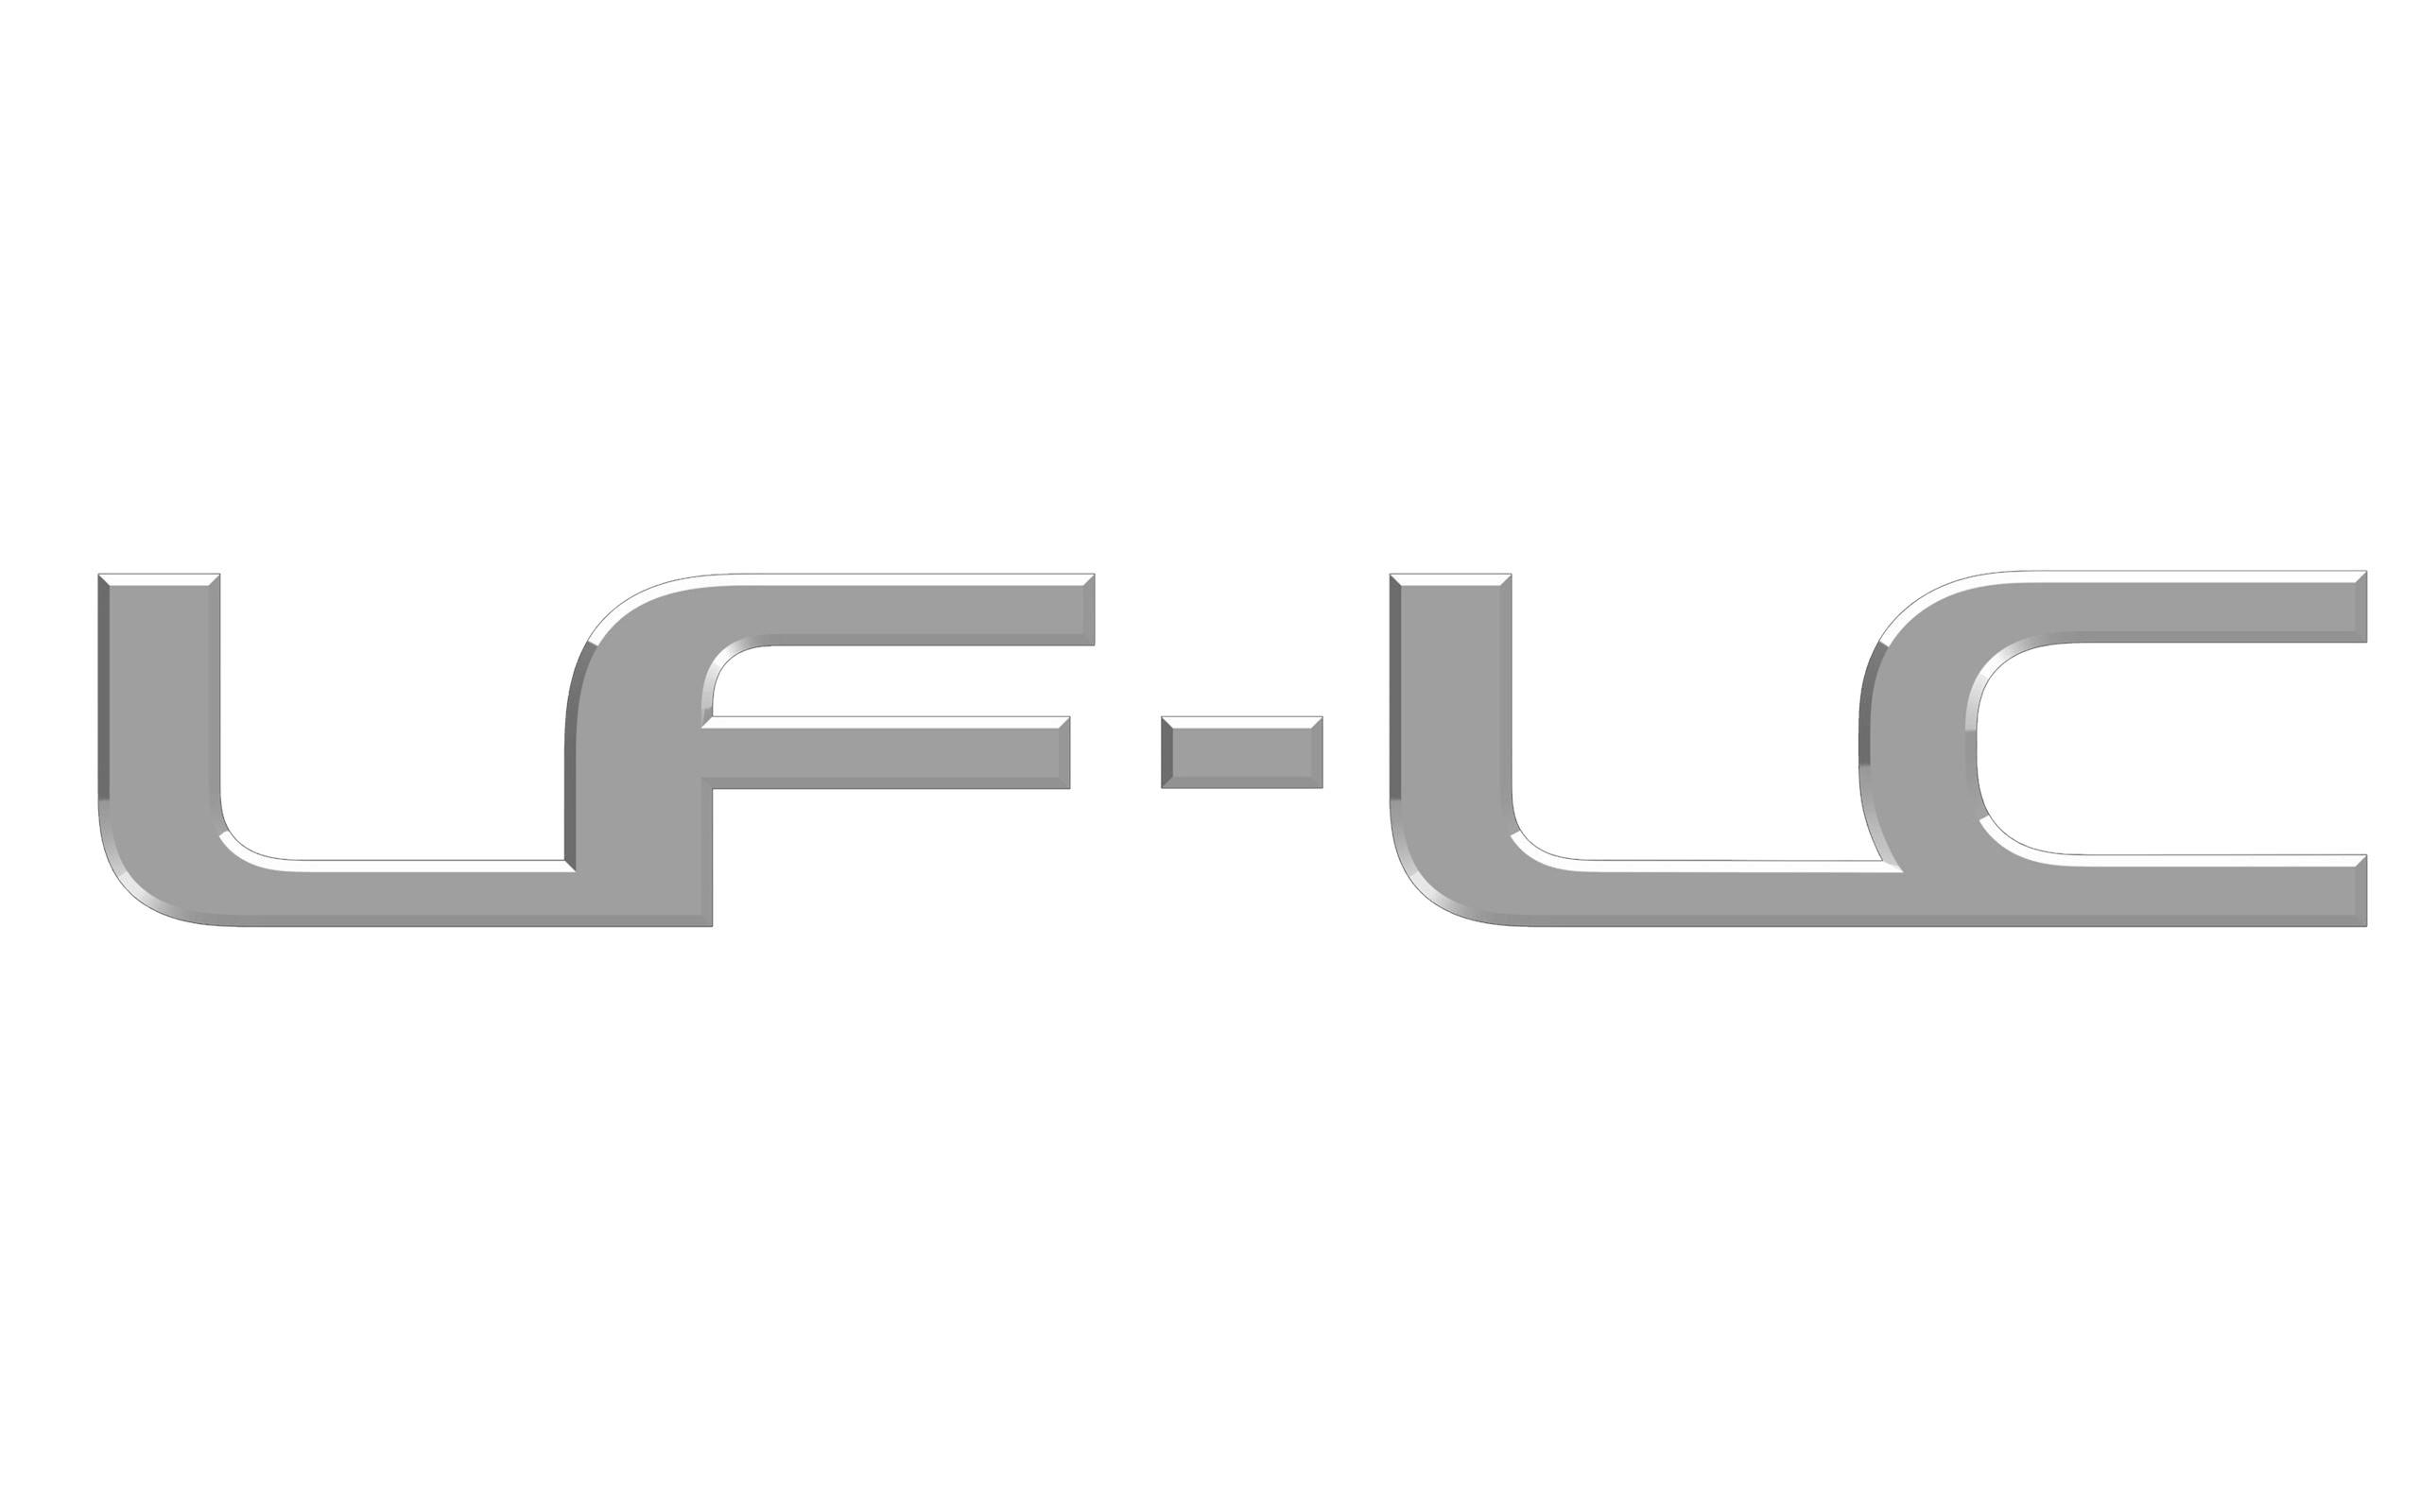 Lexus Lf Lc Concept Photo Gallery